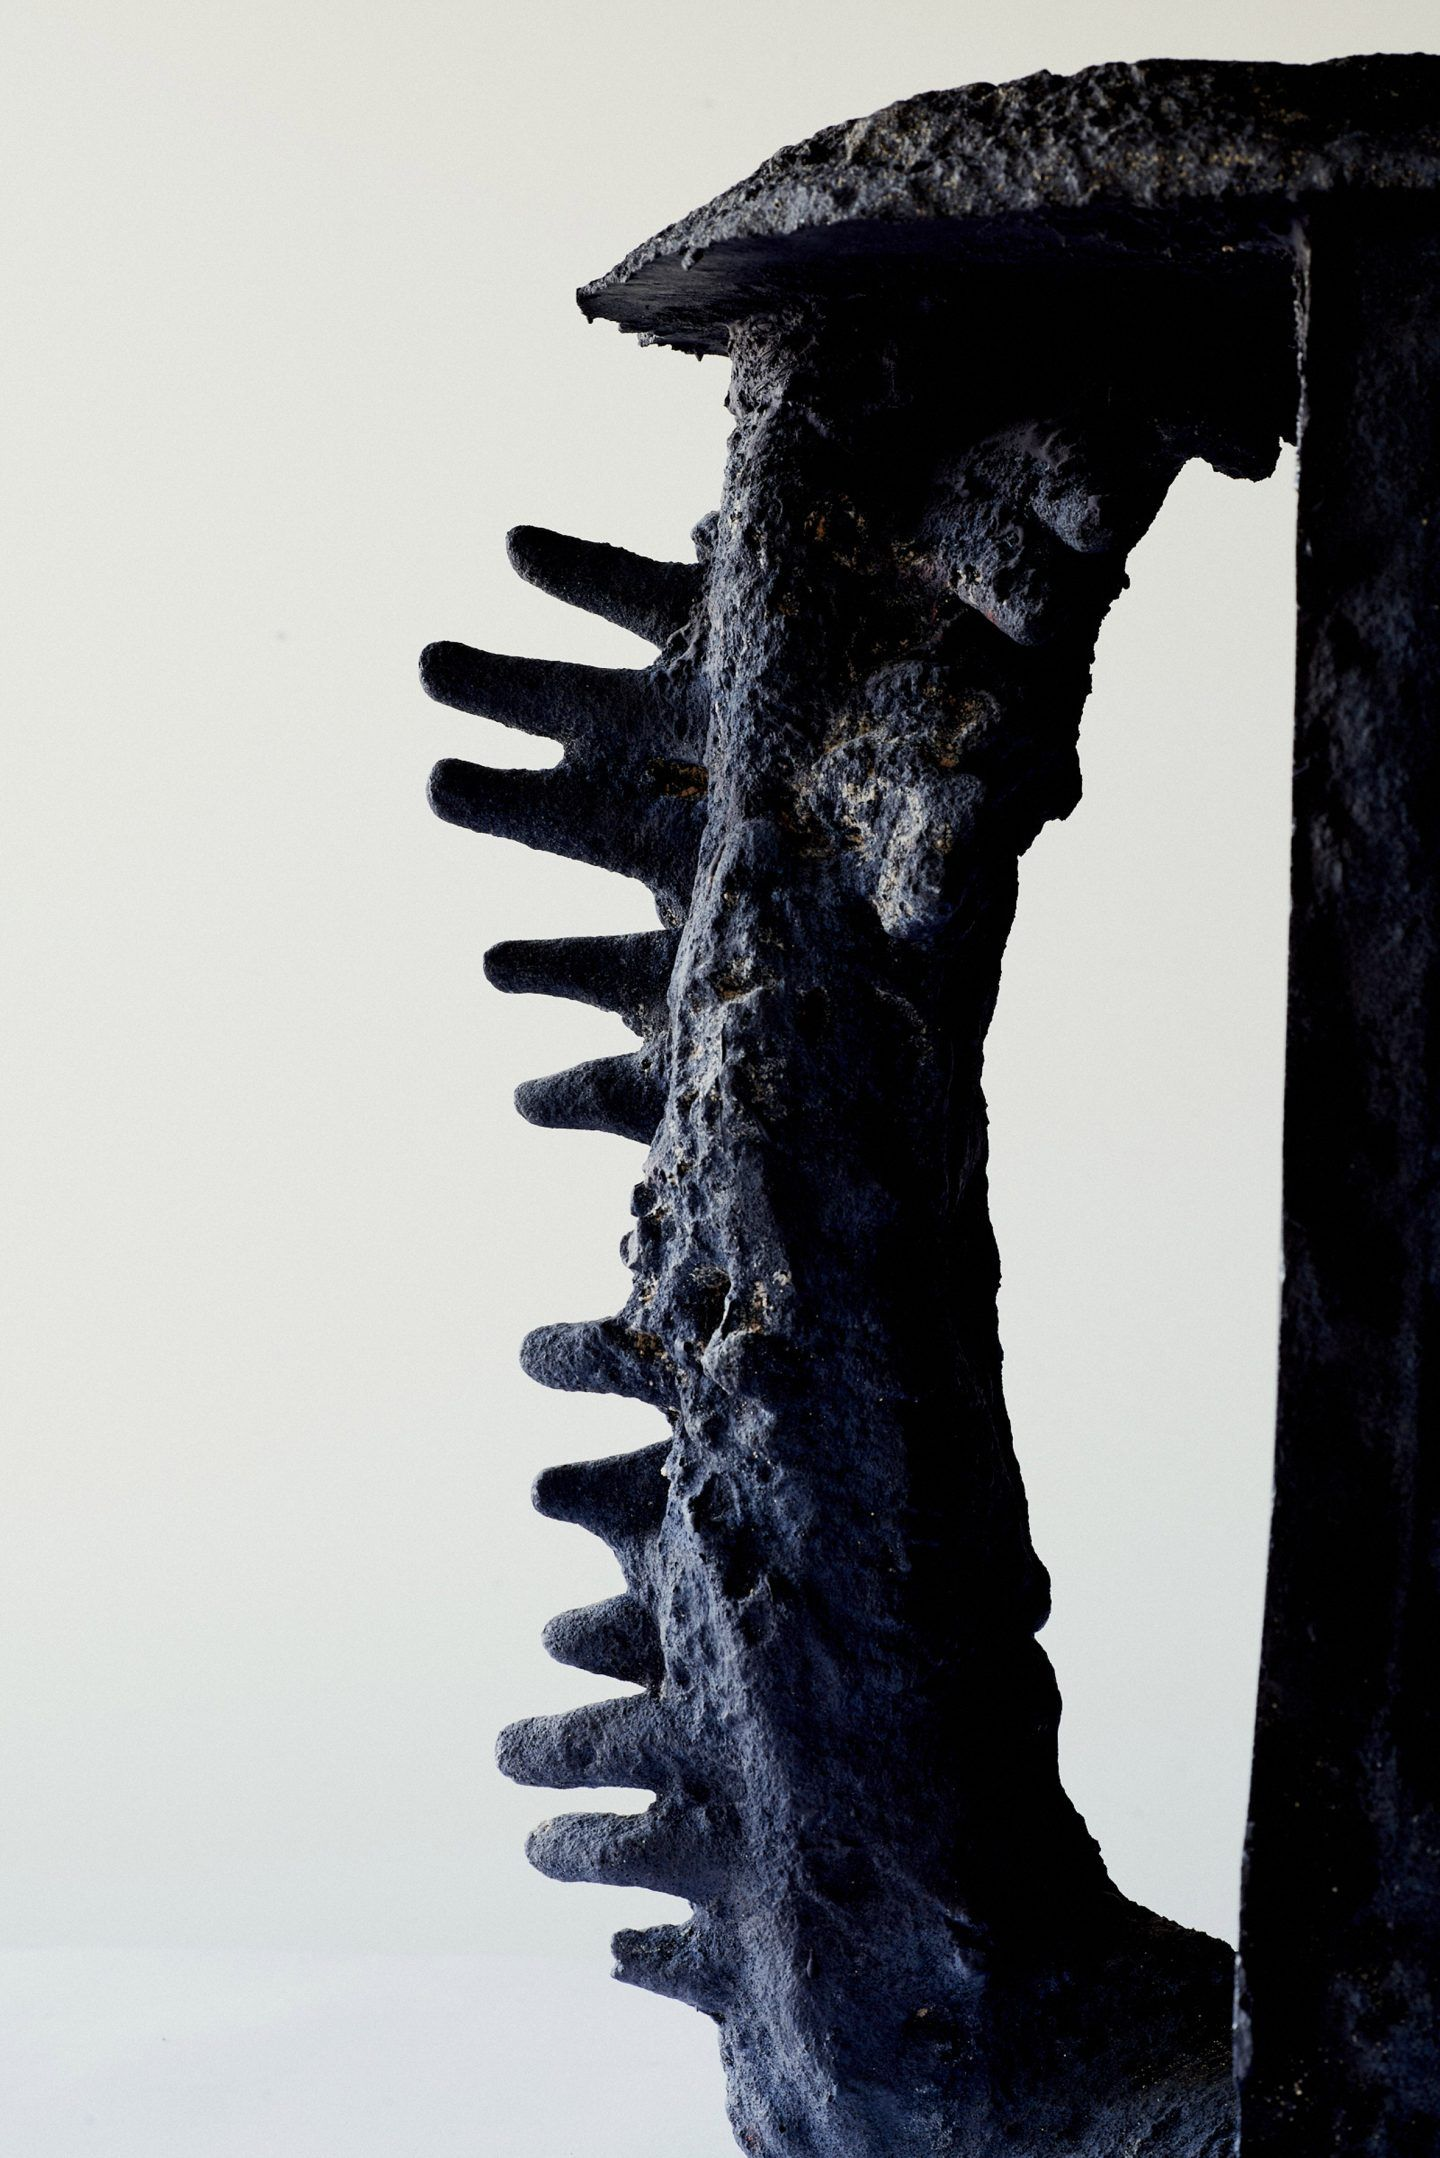 IGNANT-Design-Kajsa-Melchior-Fictive-Erosion-04